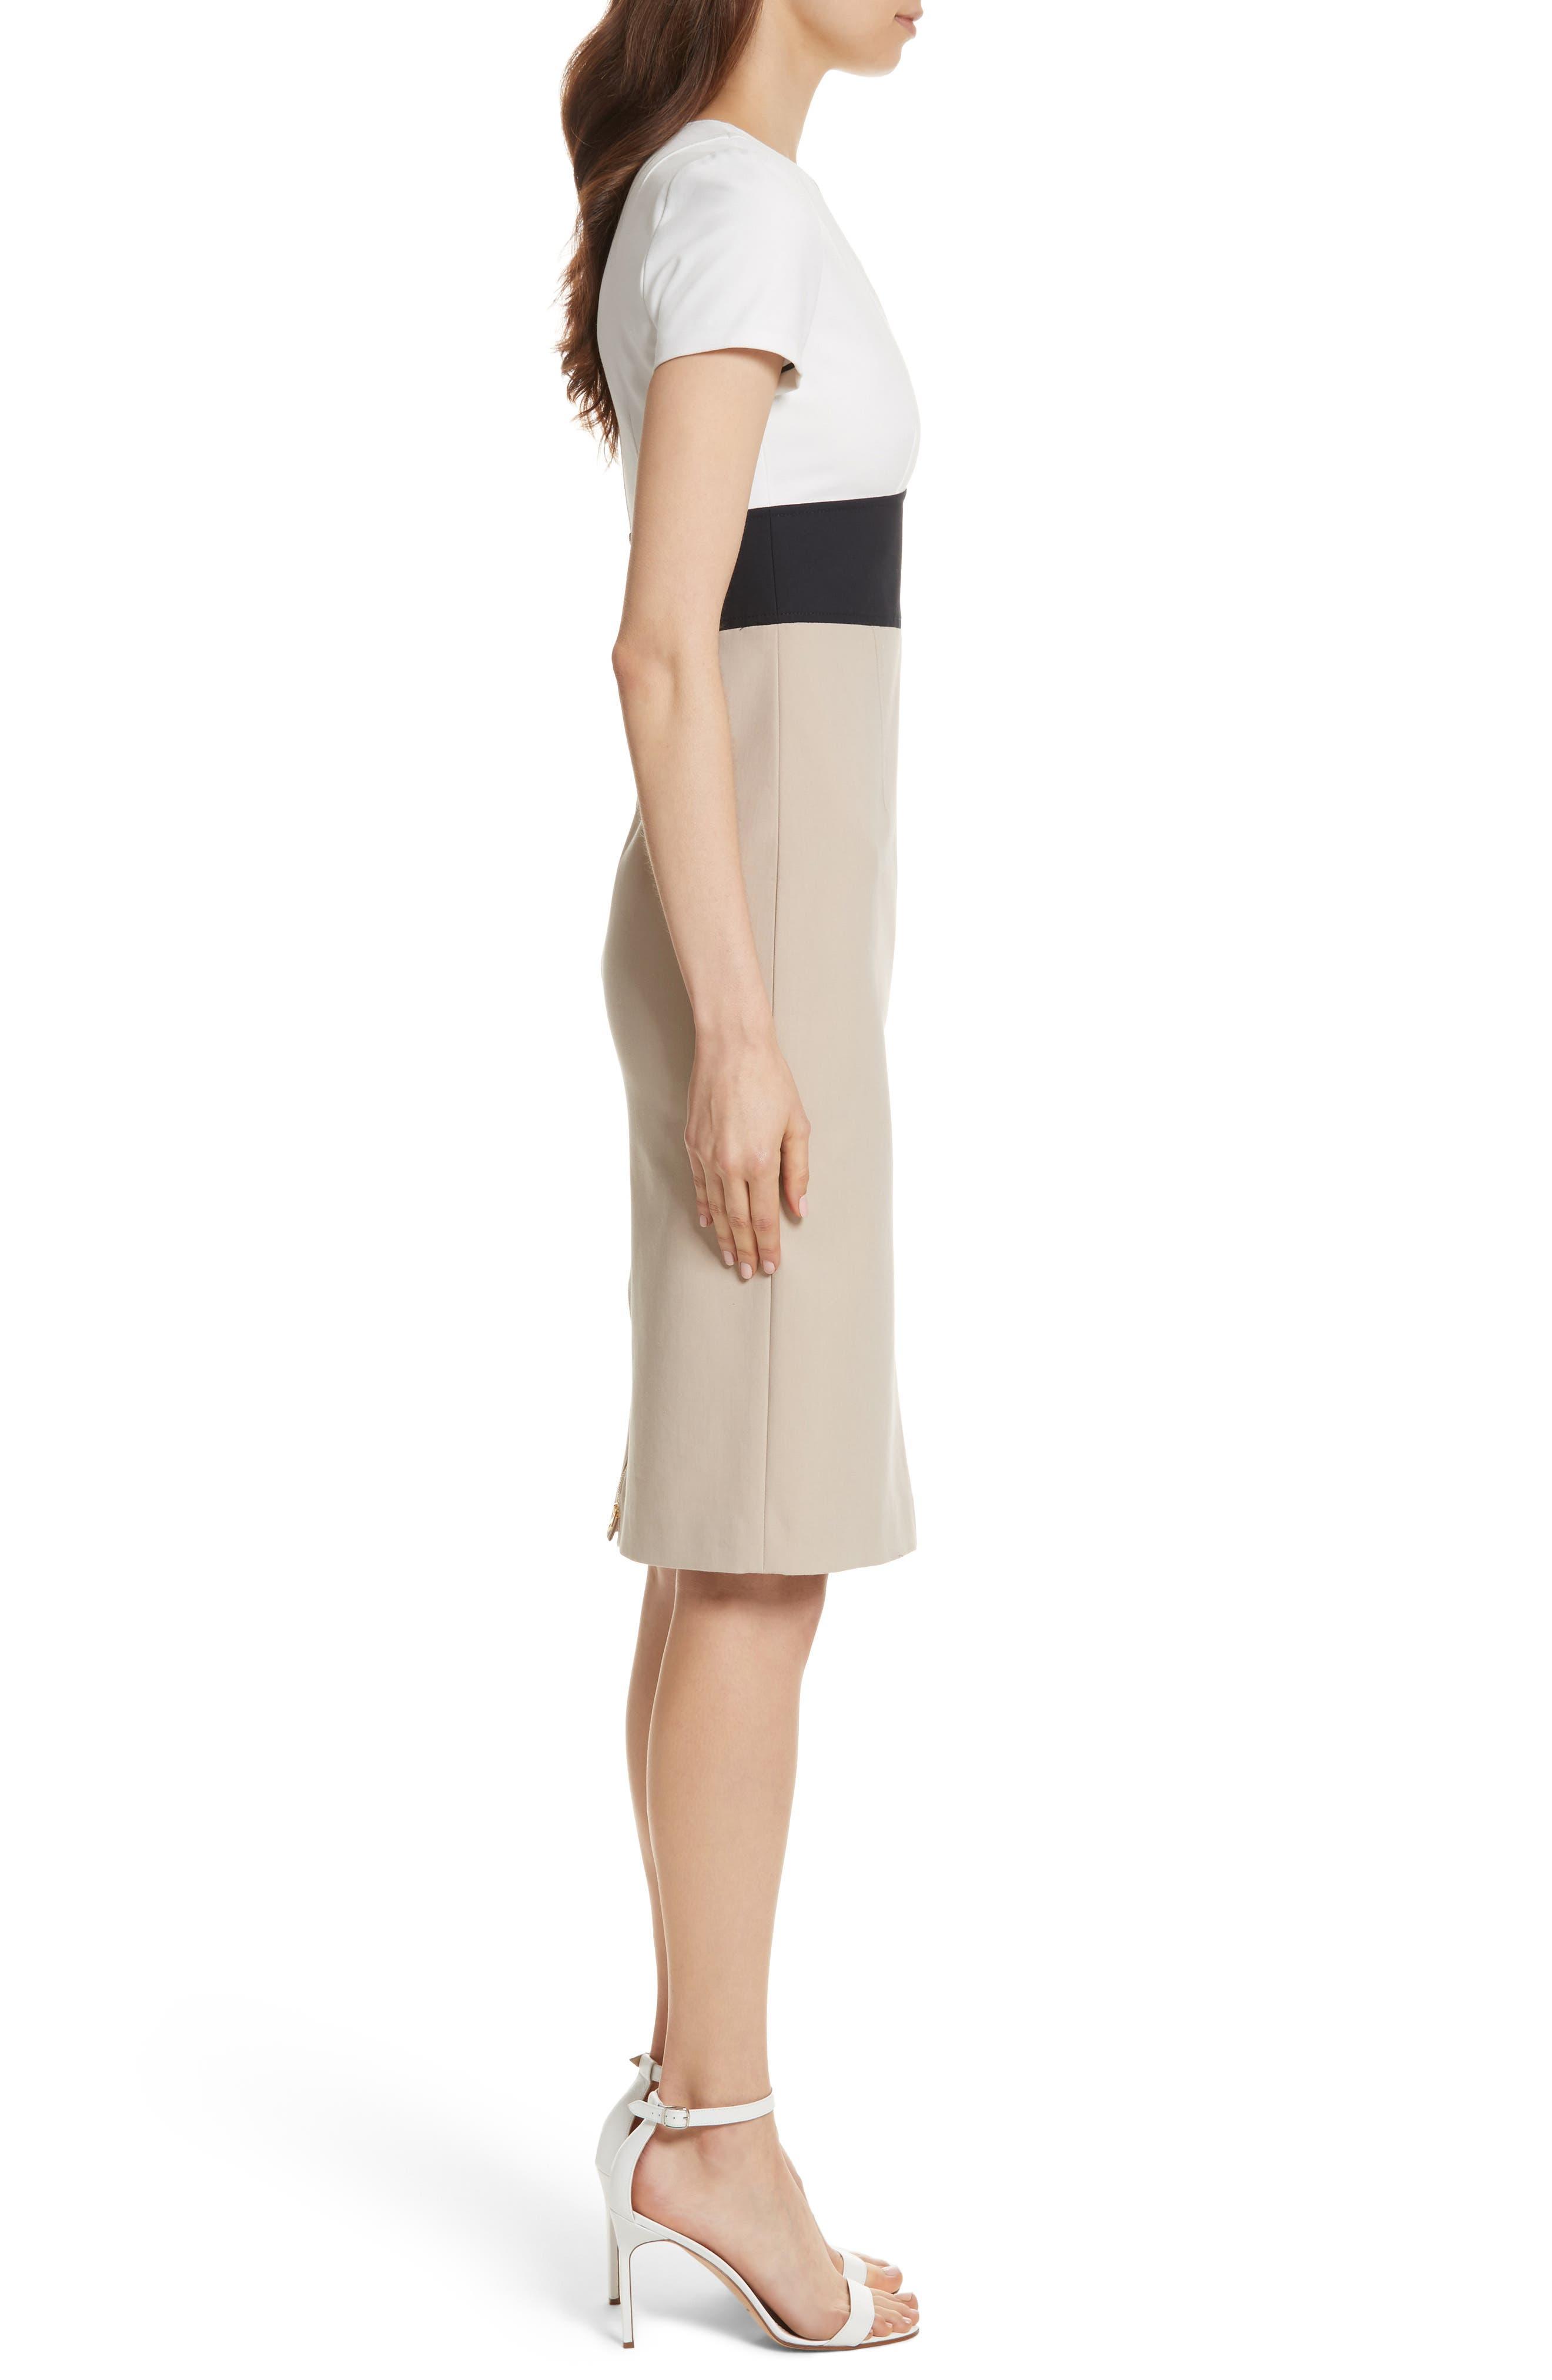 Diane von Furstenberg Colorblock Stretch Cotton Blend Sheath Dress,                             Alternate thumbnail 3, color,                             Sand/ Alexander Navy/ White